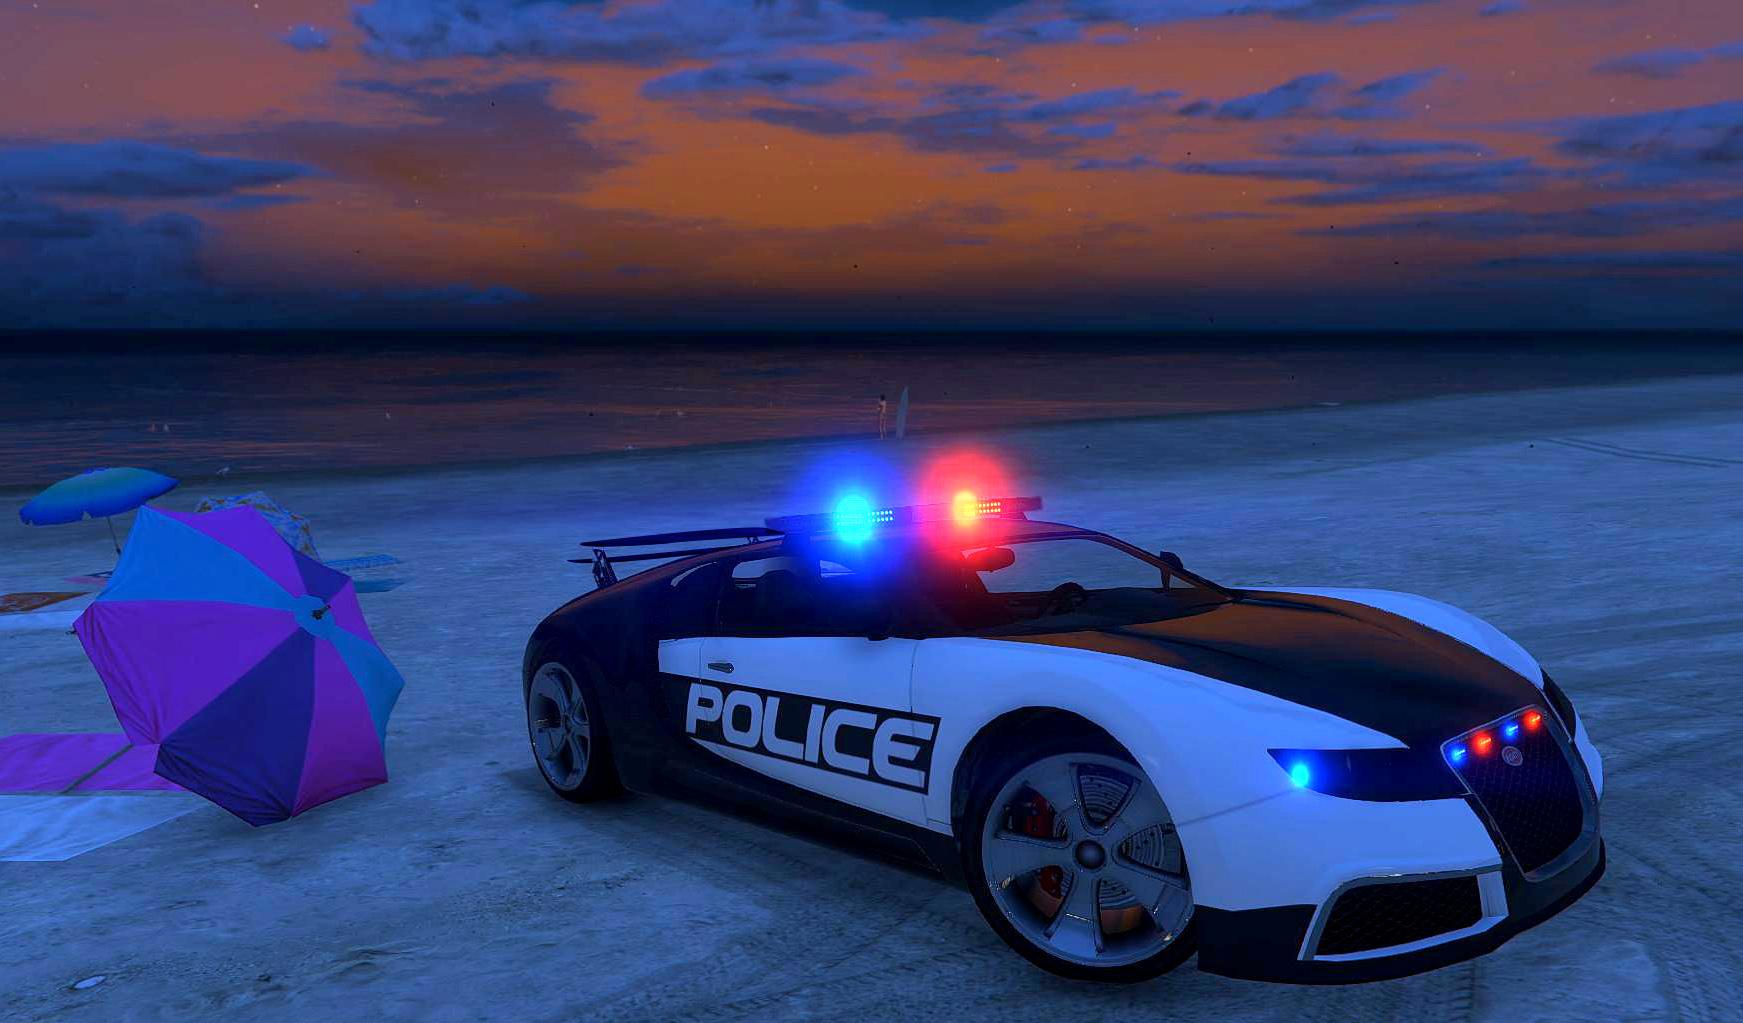 bugatti adder police lspd gta5. Black Bedroom Furniture Sets. Home Design Ideas